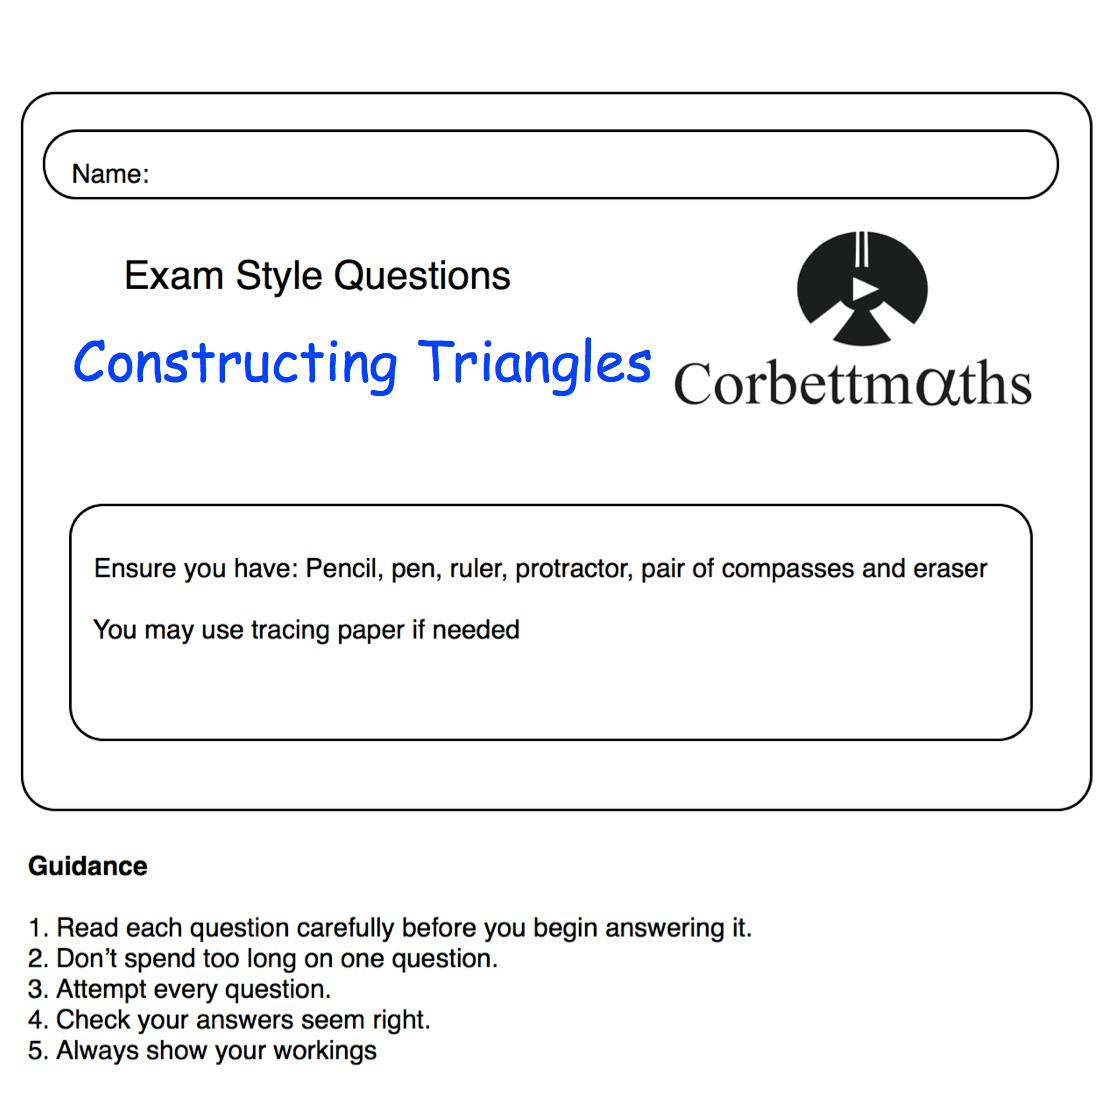 Constructing Triangles Practice Questions – Corbettmaths [ 1118 x 1116 Pixel ]